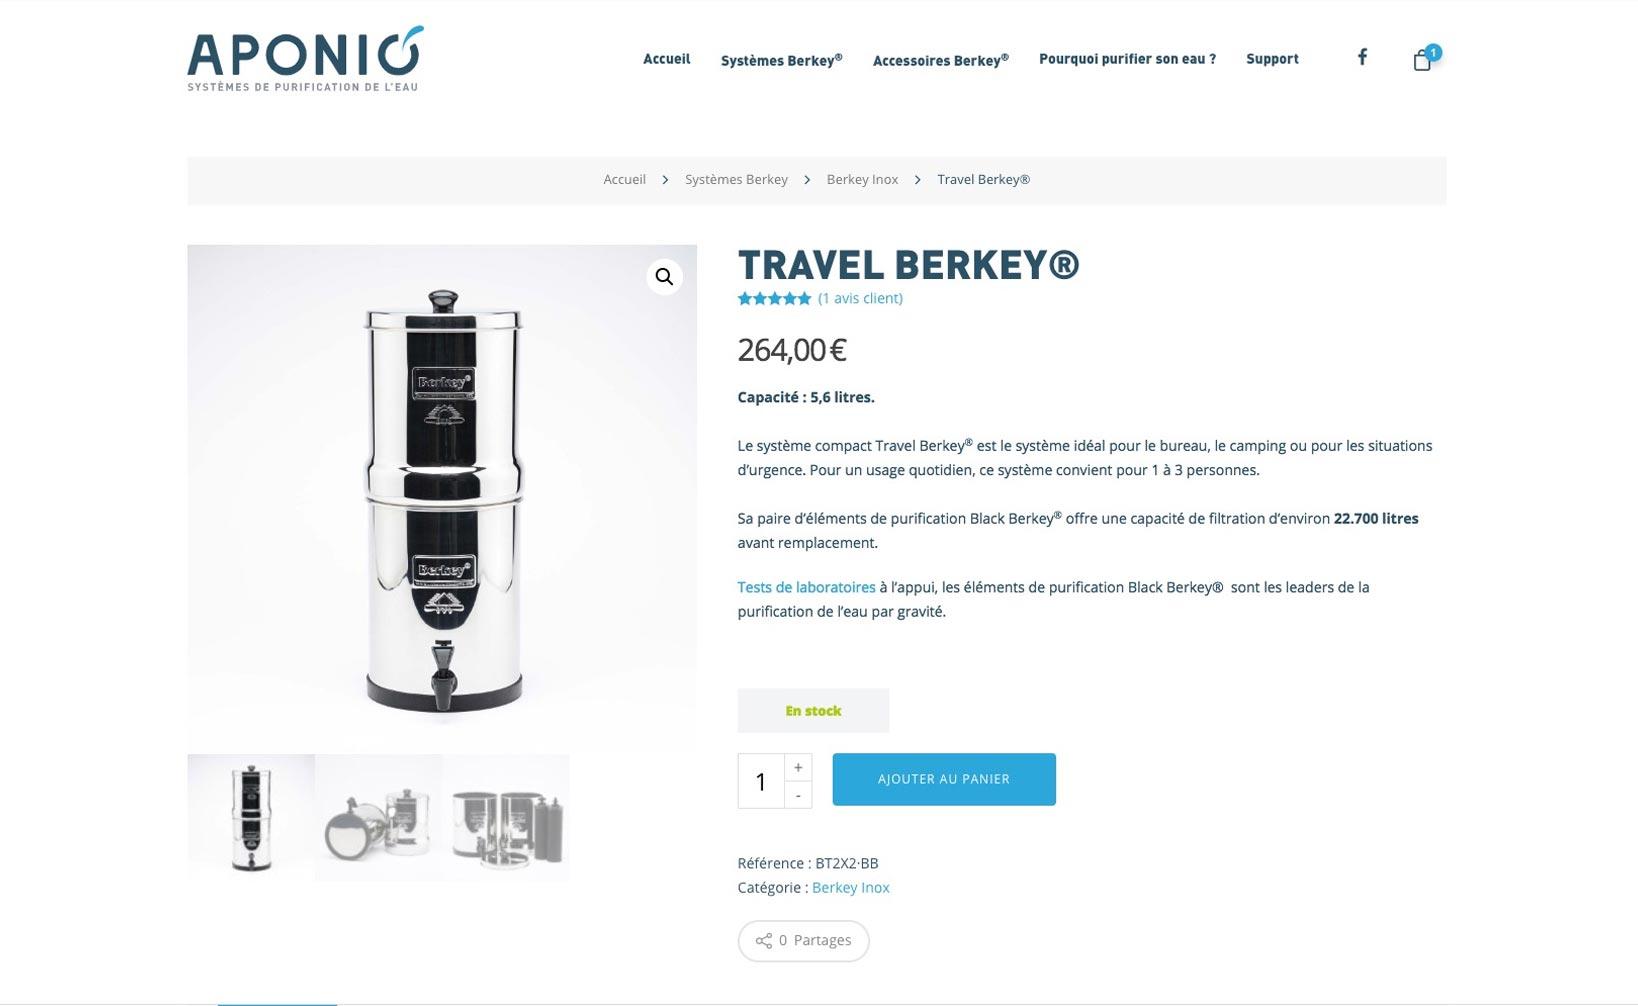 Aponio Desktop3